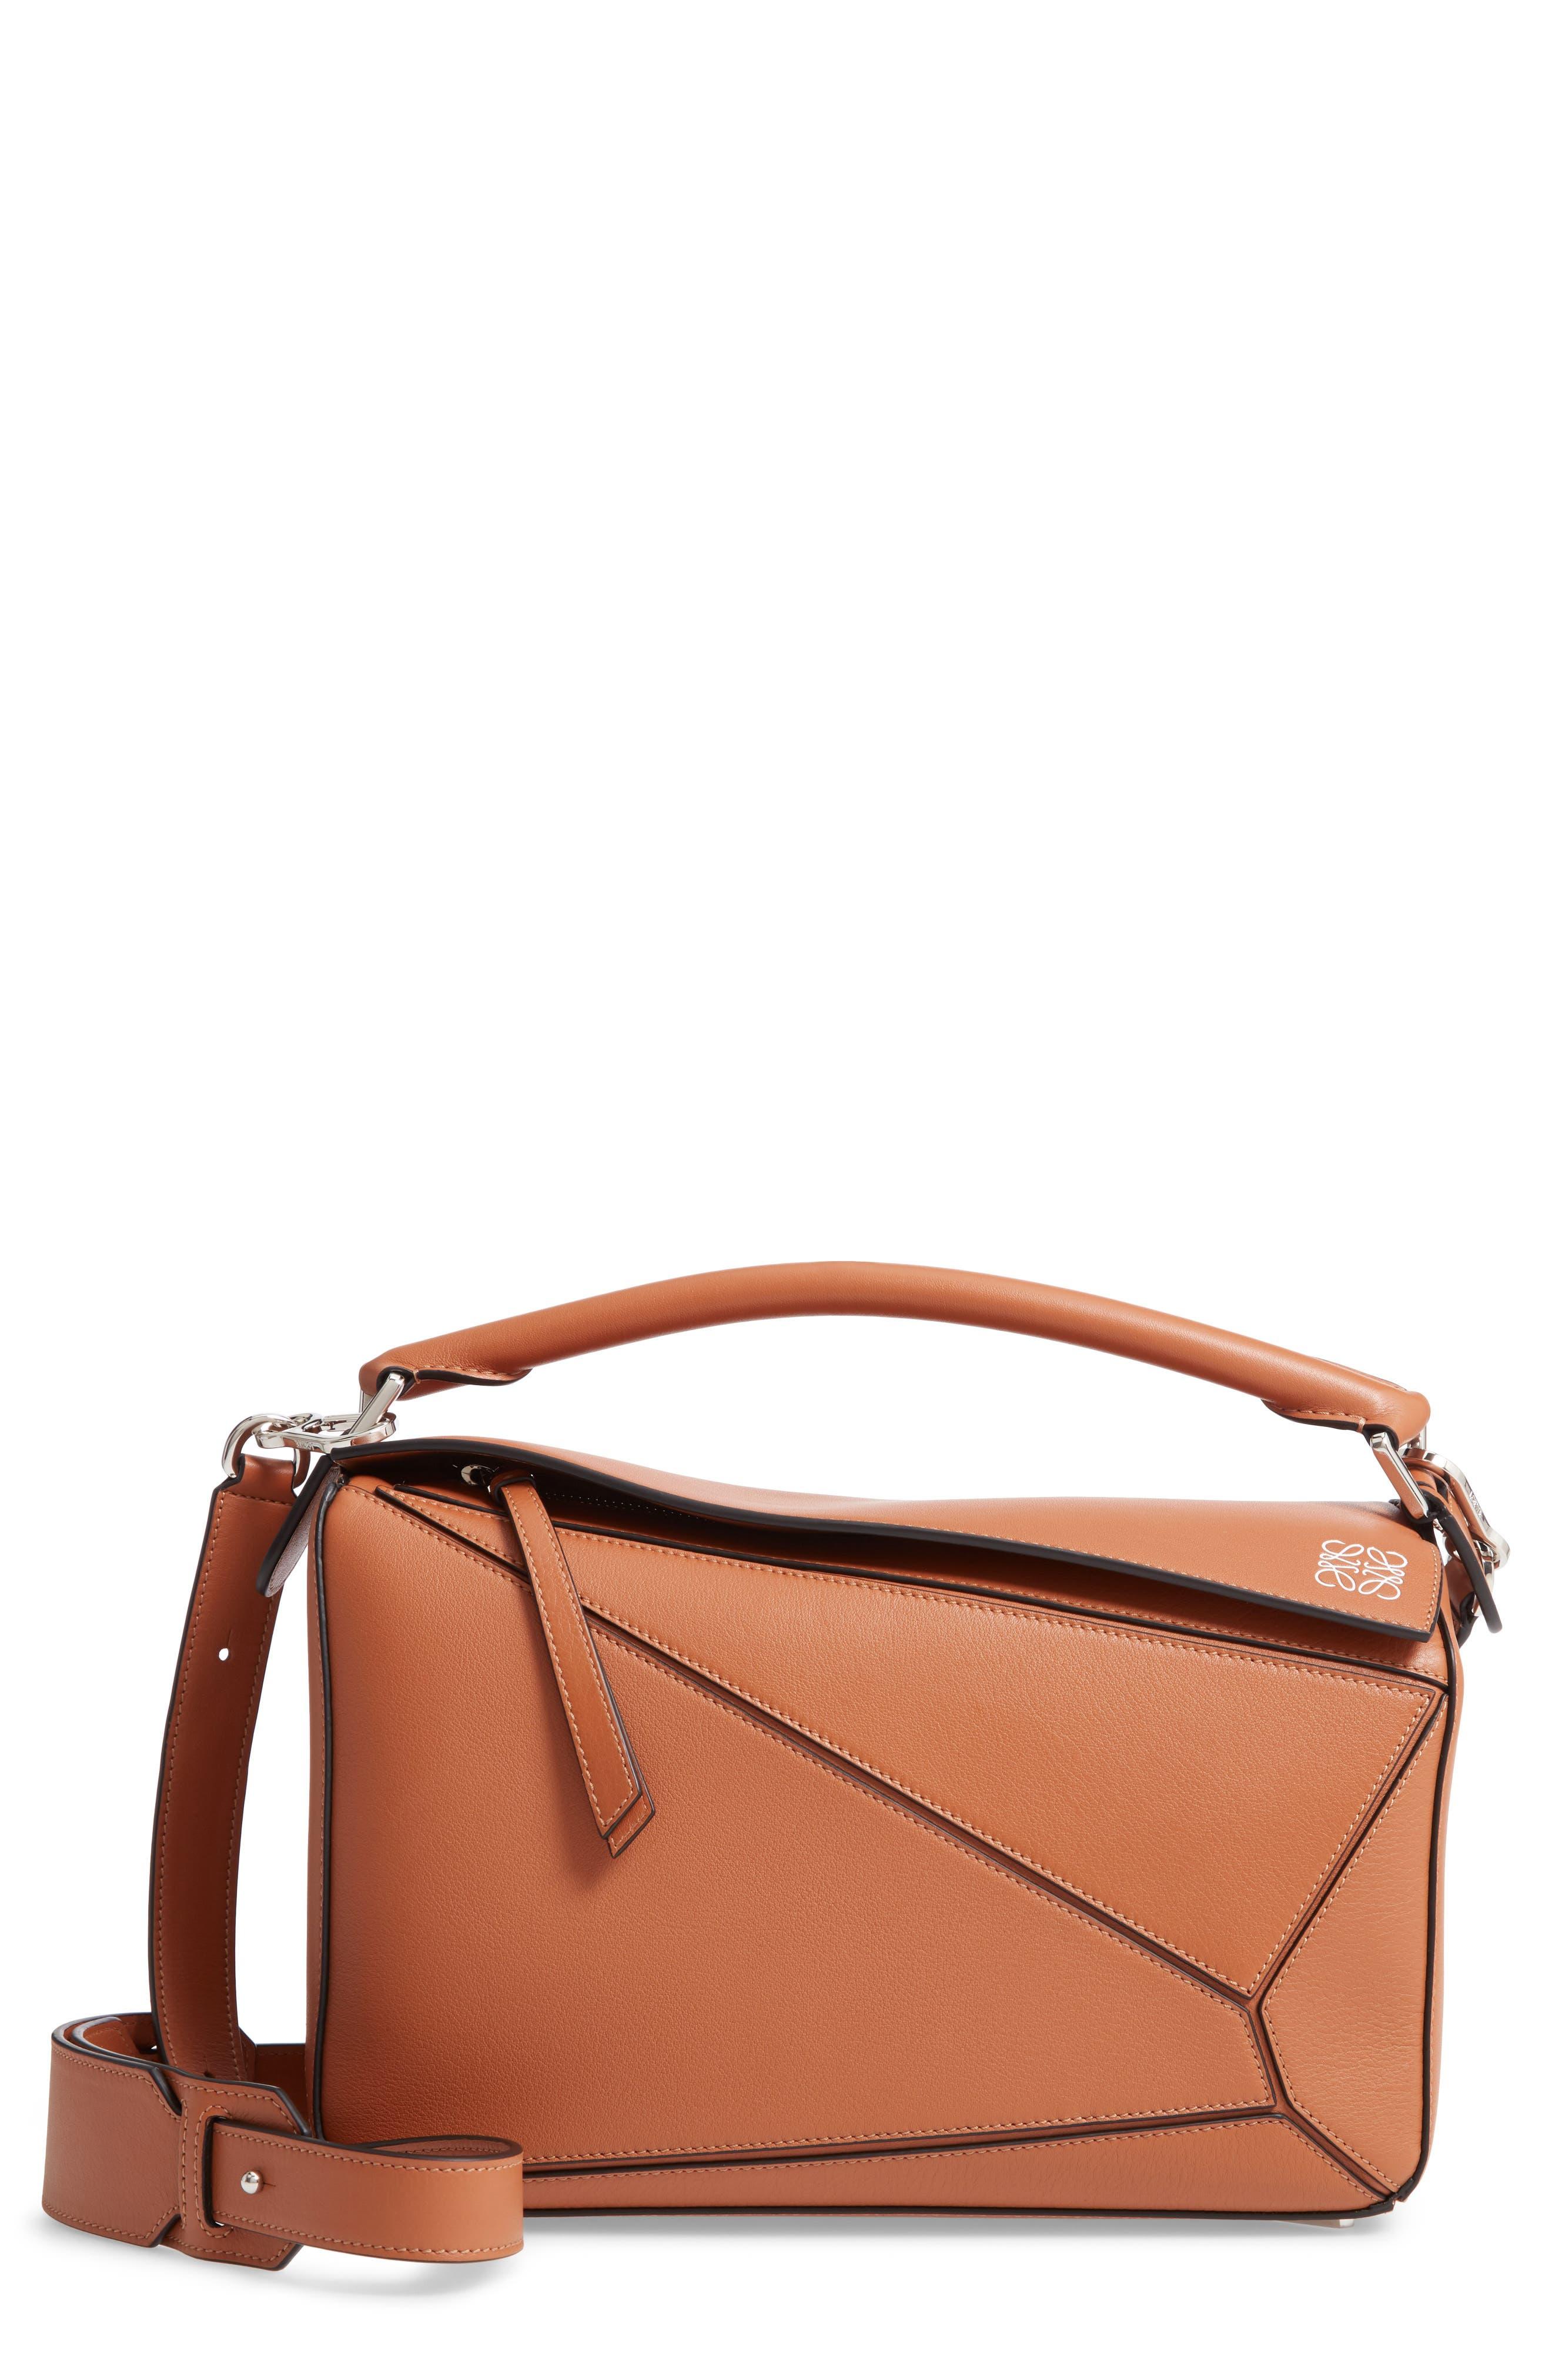 Medium Puzzle Bag,                         Main,                         color, TAN